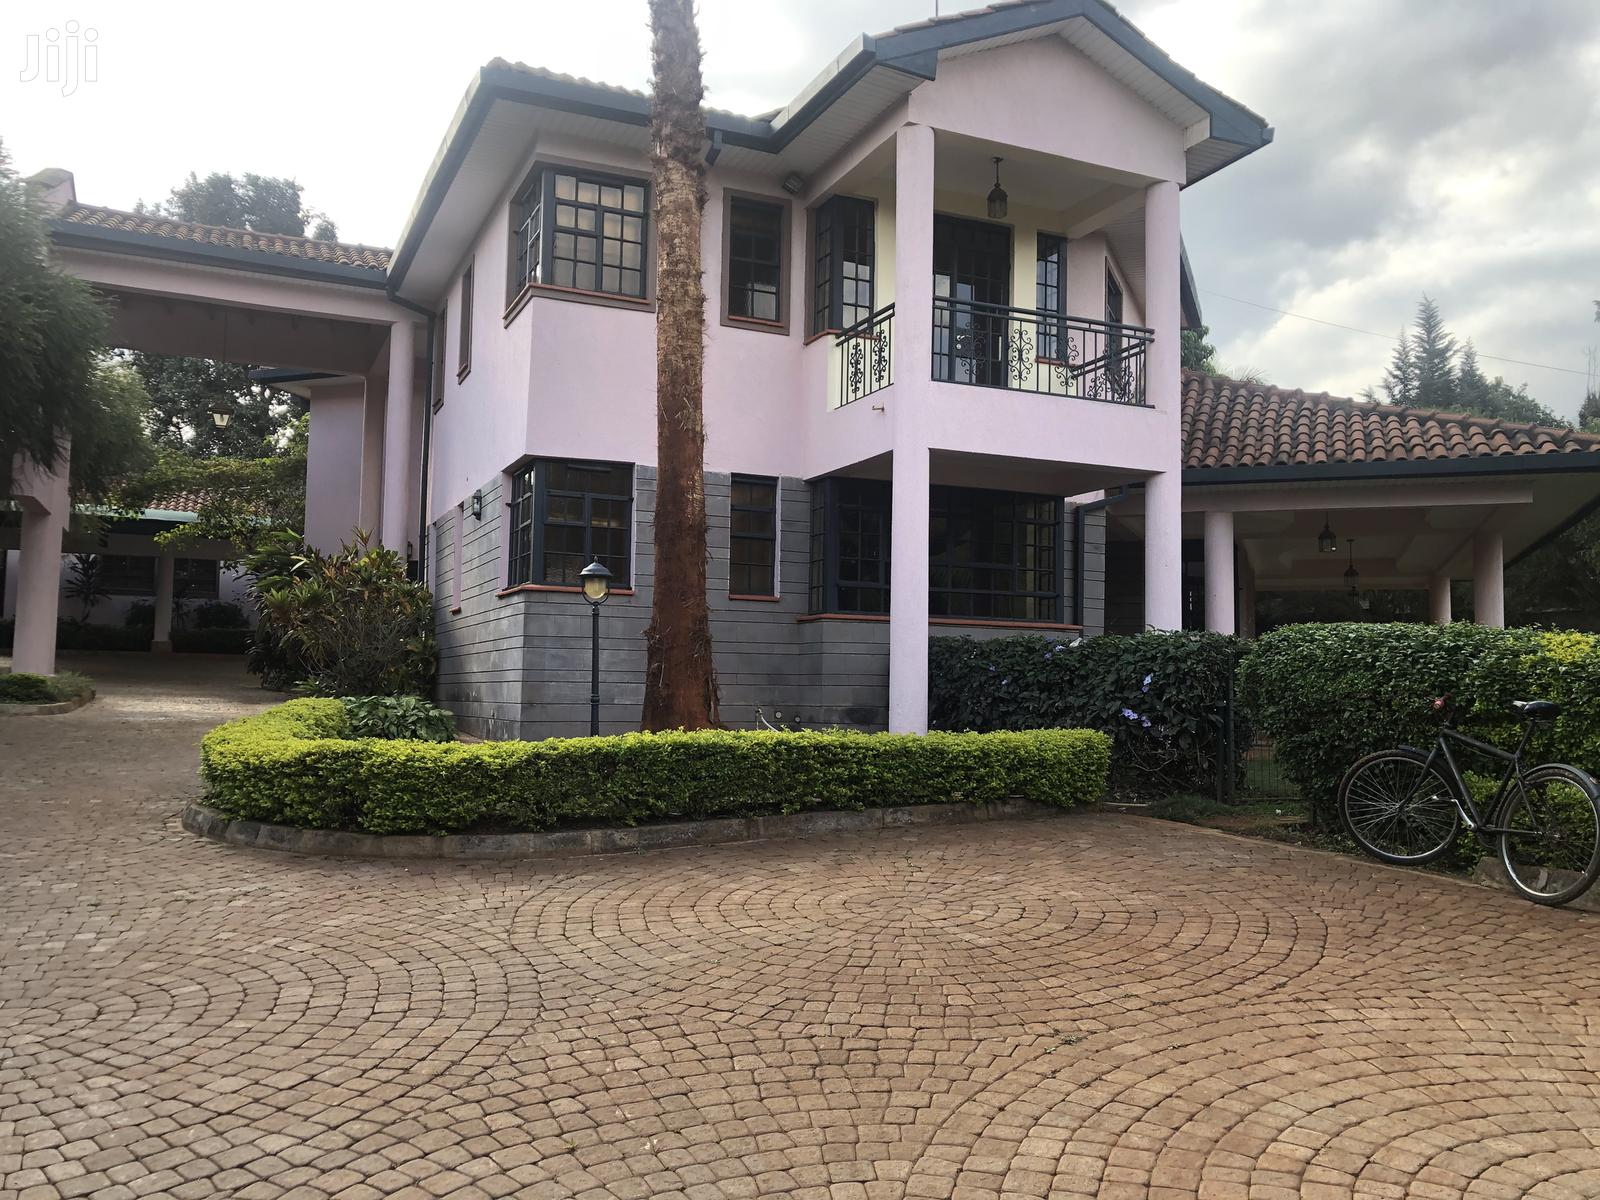 5 Bedrooms House For Sale In Runda